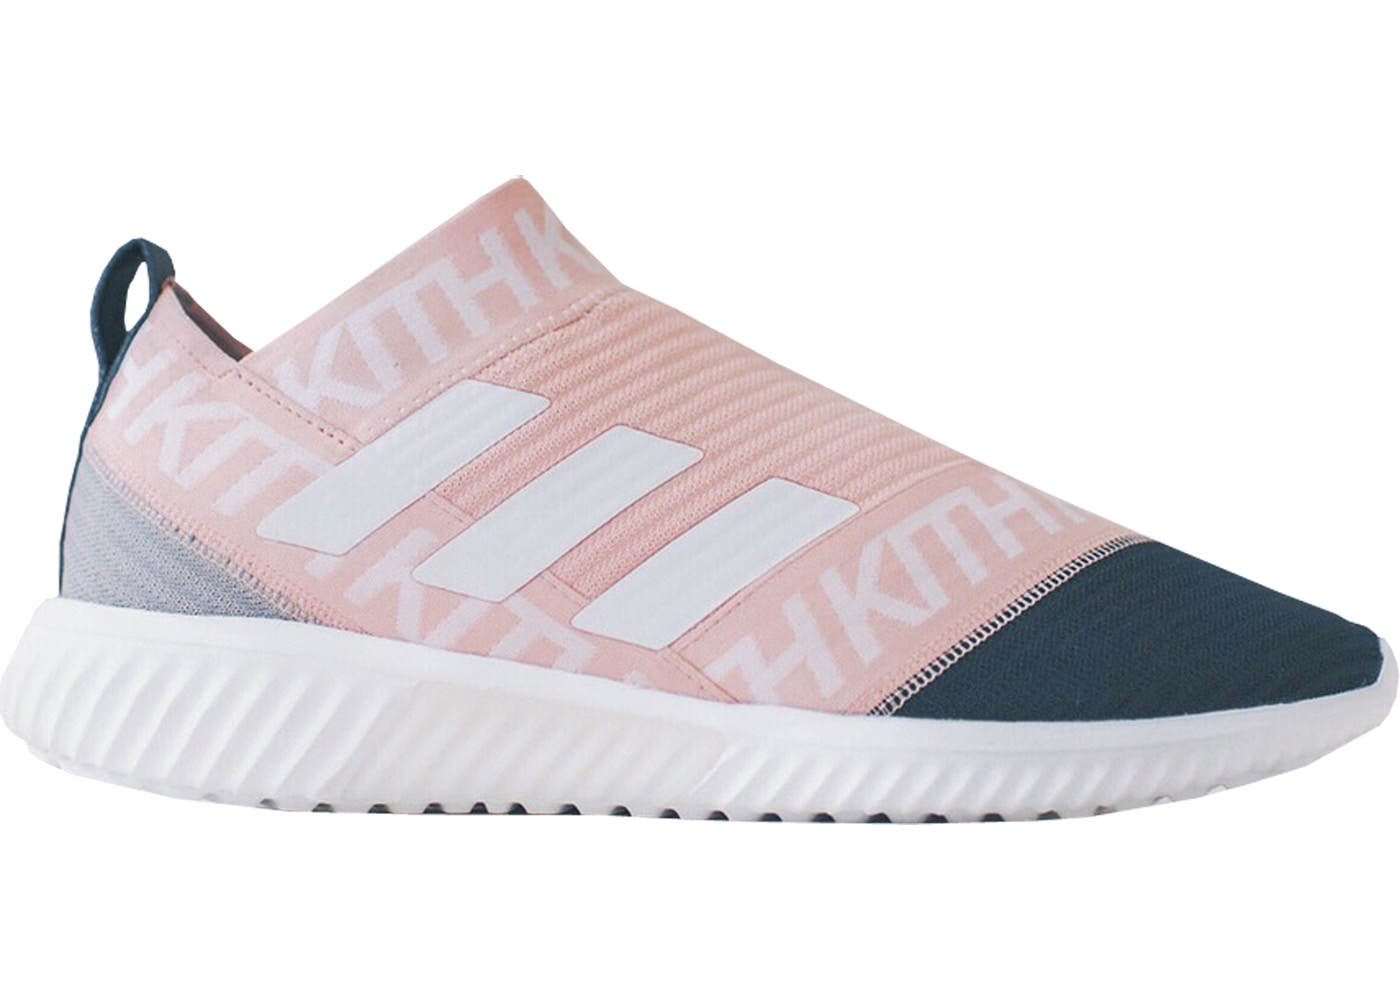 8d07cd15c039 adidas Nemeziz Tango 17.1 Kith Flamingos - AC7509